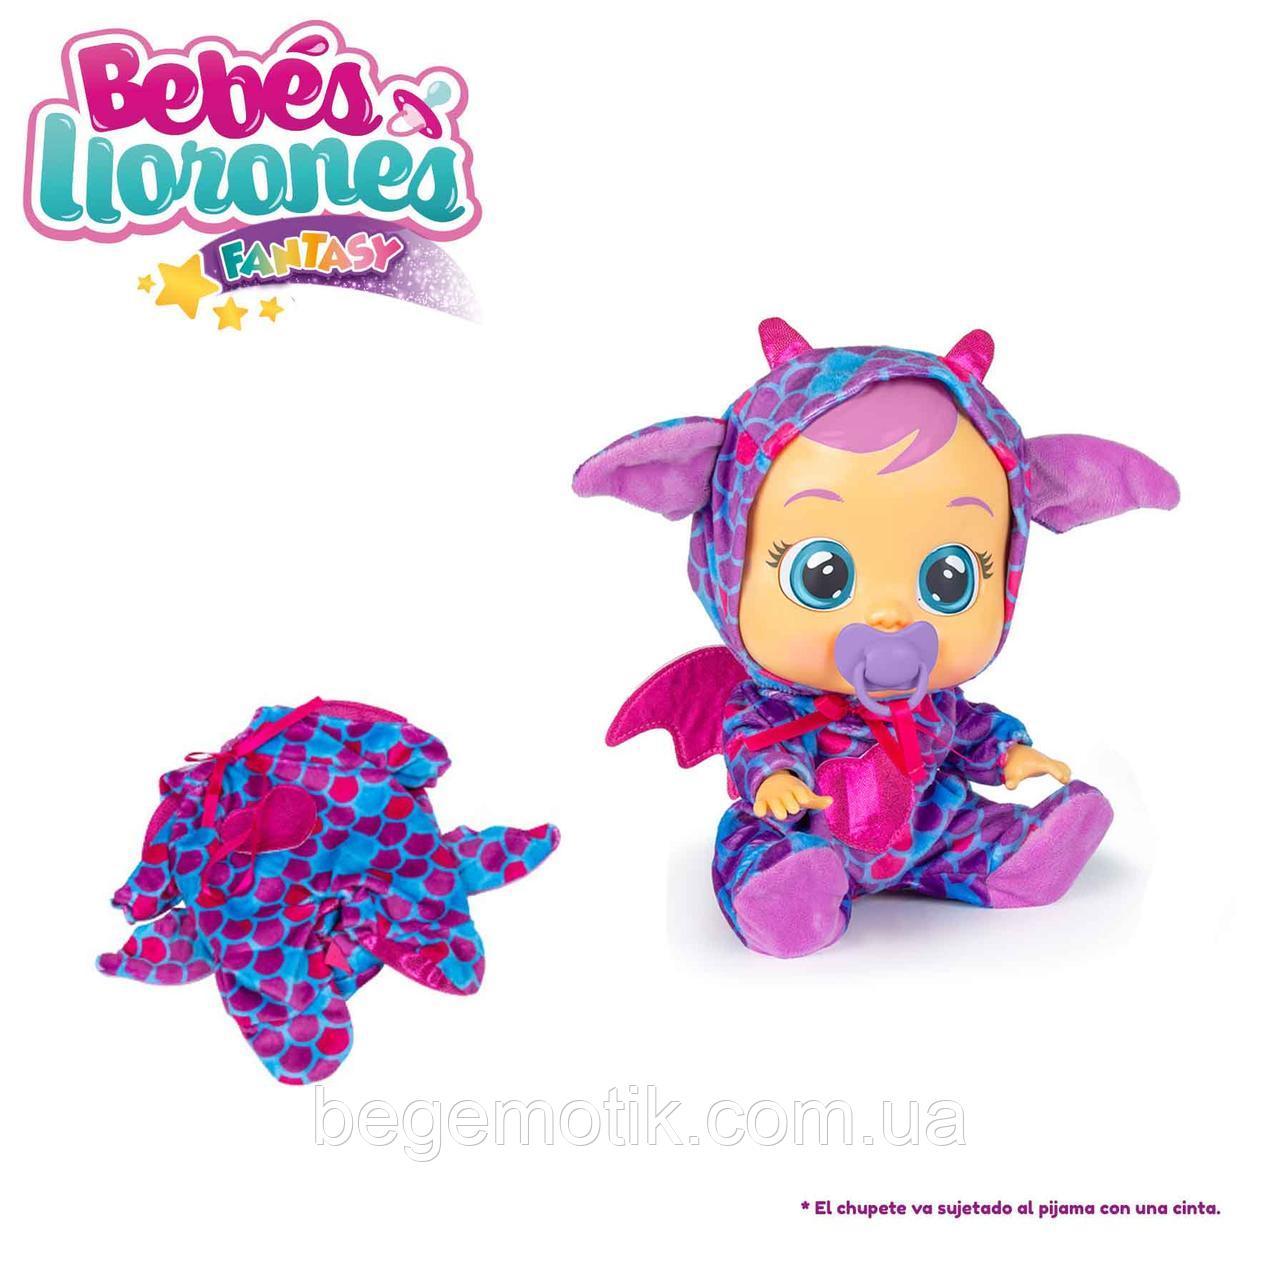 Cry Babies Костюмчик Пижама Baby Crying Fantasy Дракона для кукол Край Беби IMC Toys 93683IM